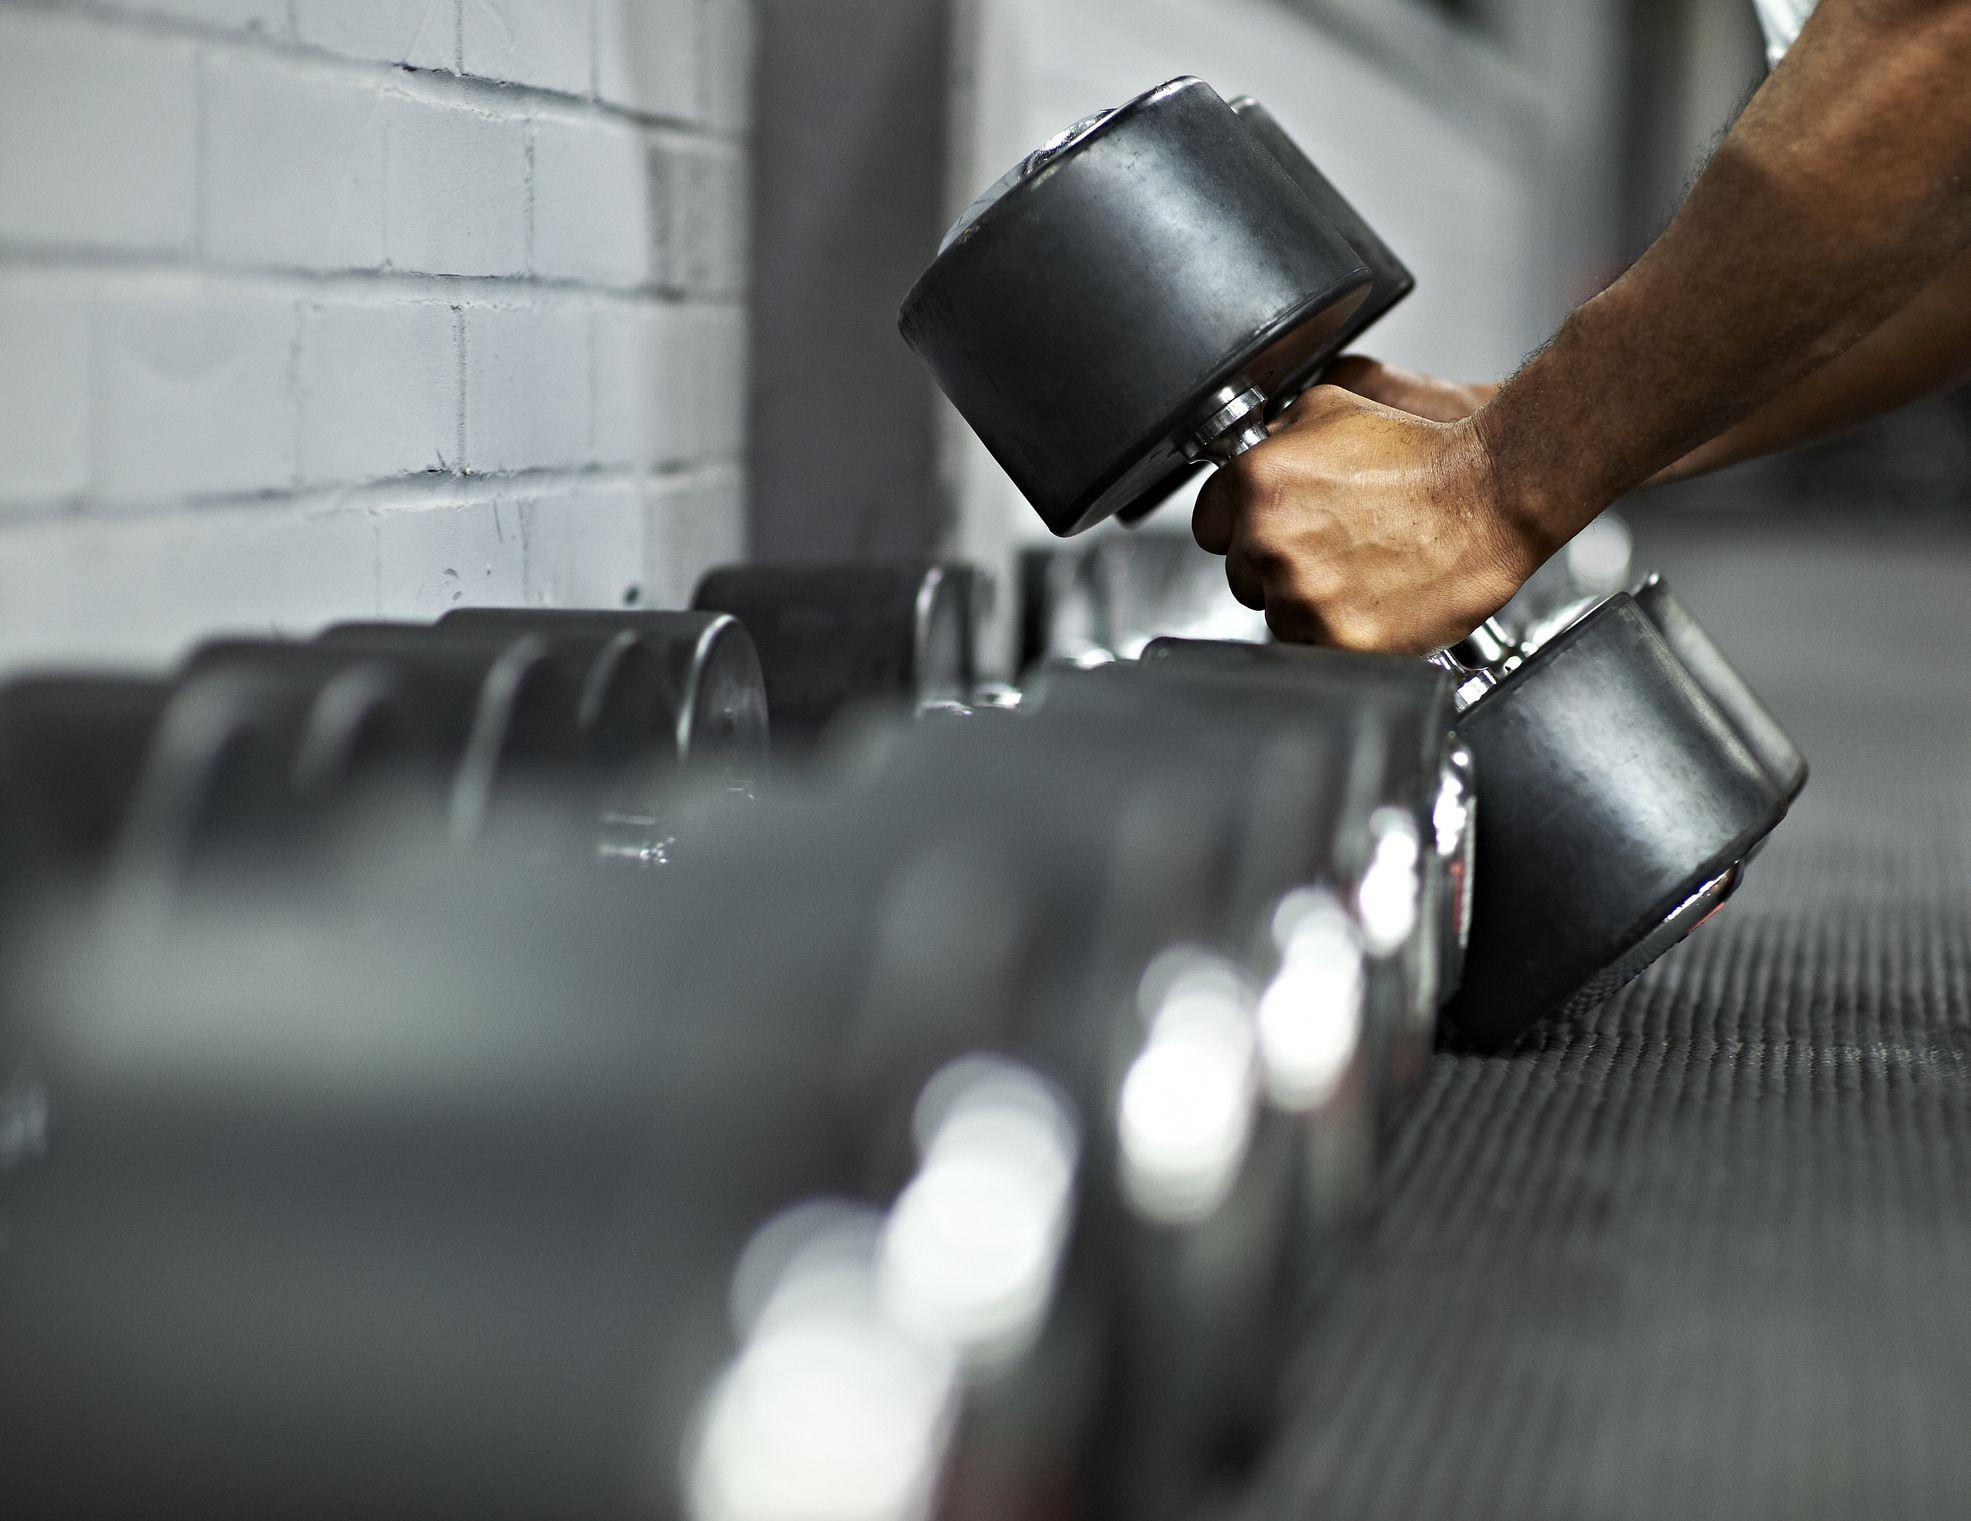 10 normas no escritas que todo miembro de un gimnasio debe respetar